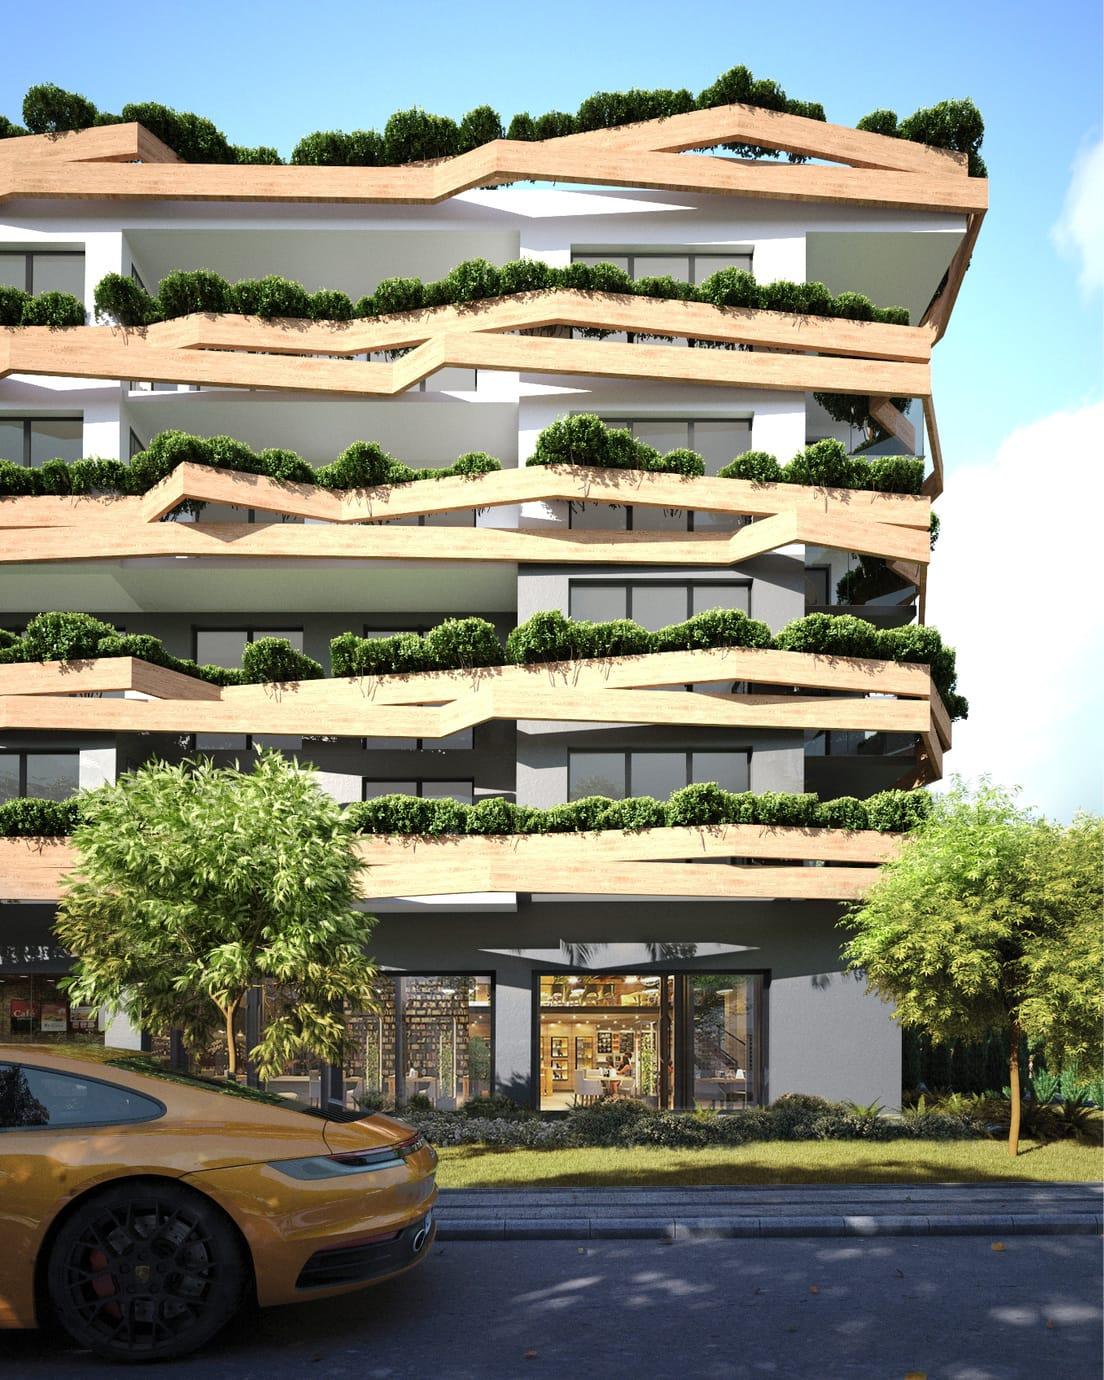 Architecture-apartment-building